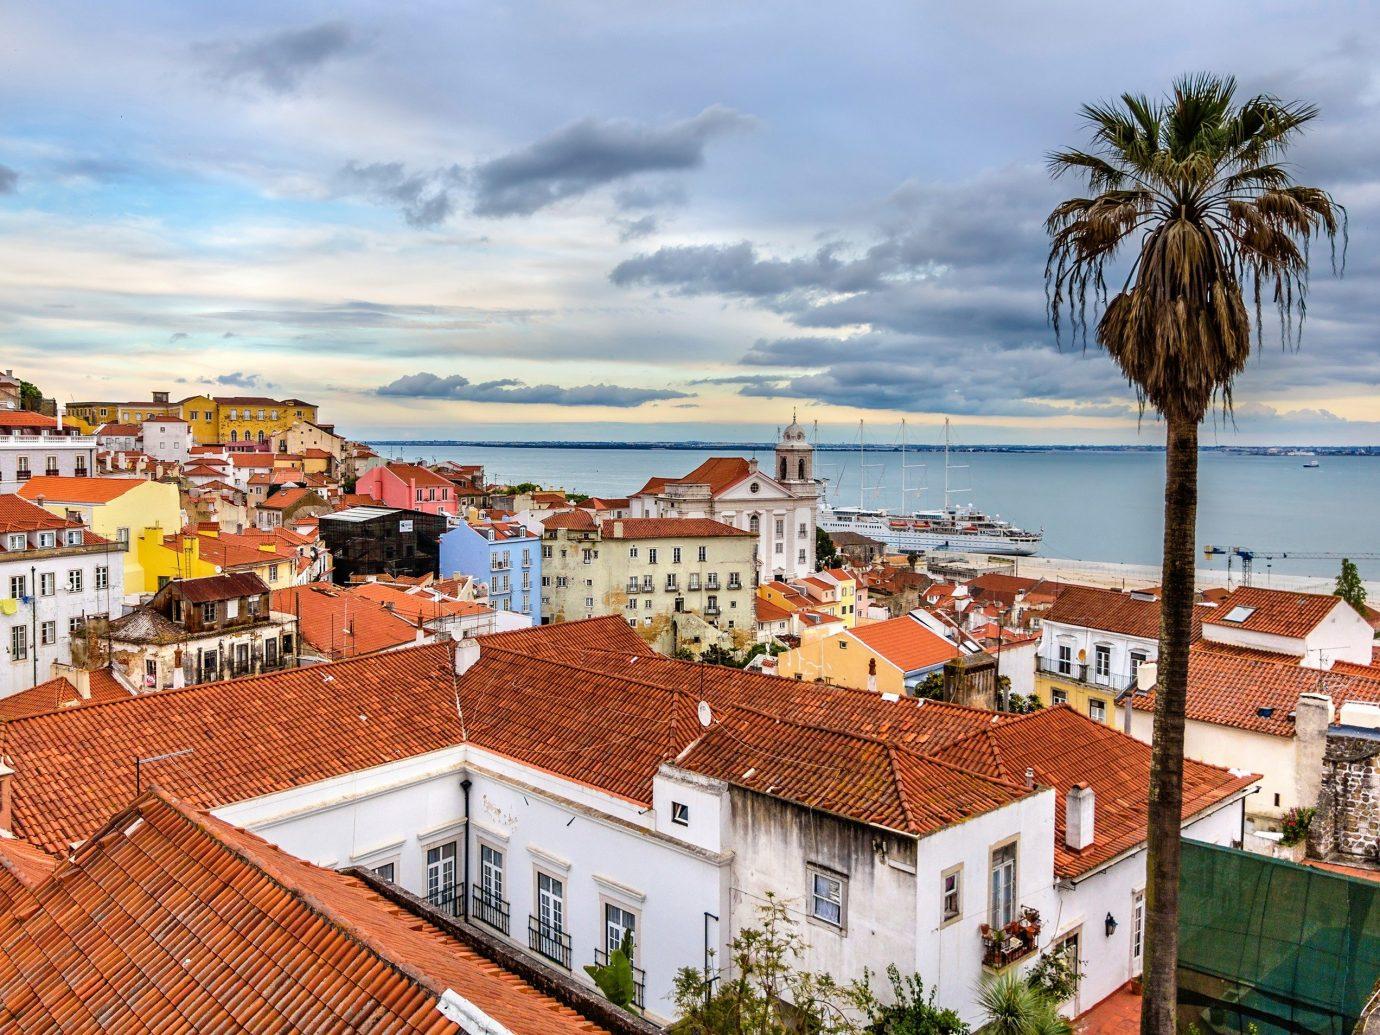 Trip Ideas sky outdoor Town Coast Sea vacation human settlement cityscape residential area Ocean Beach bay Island